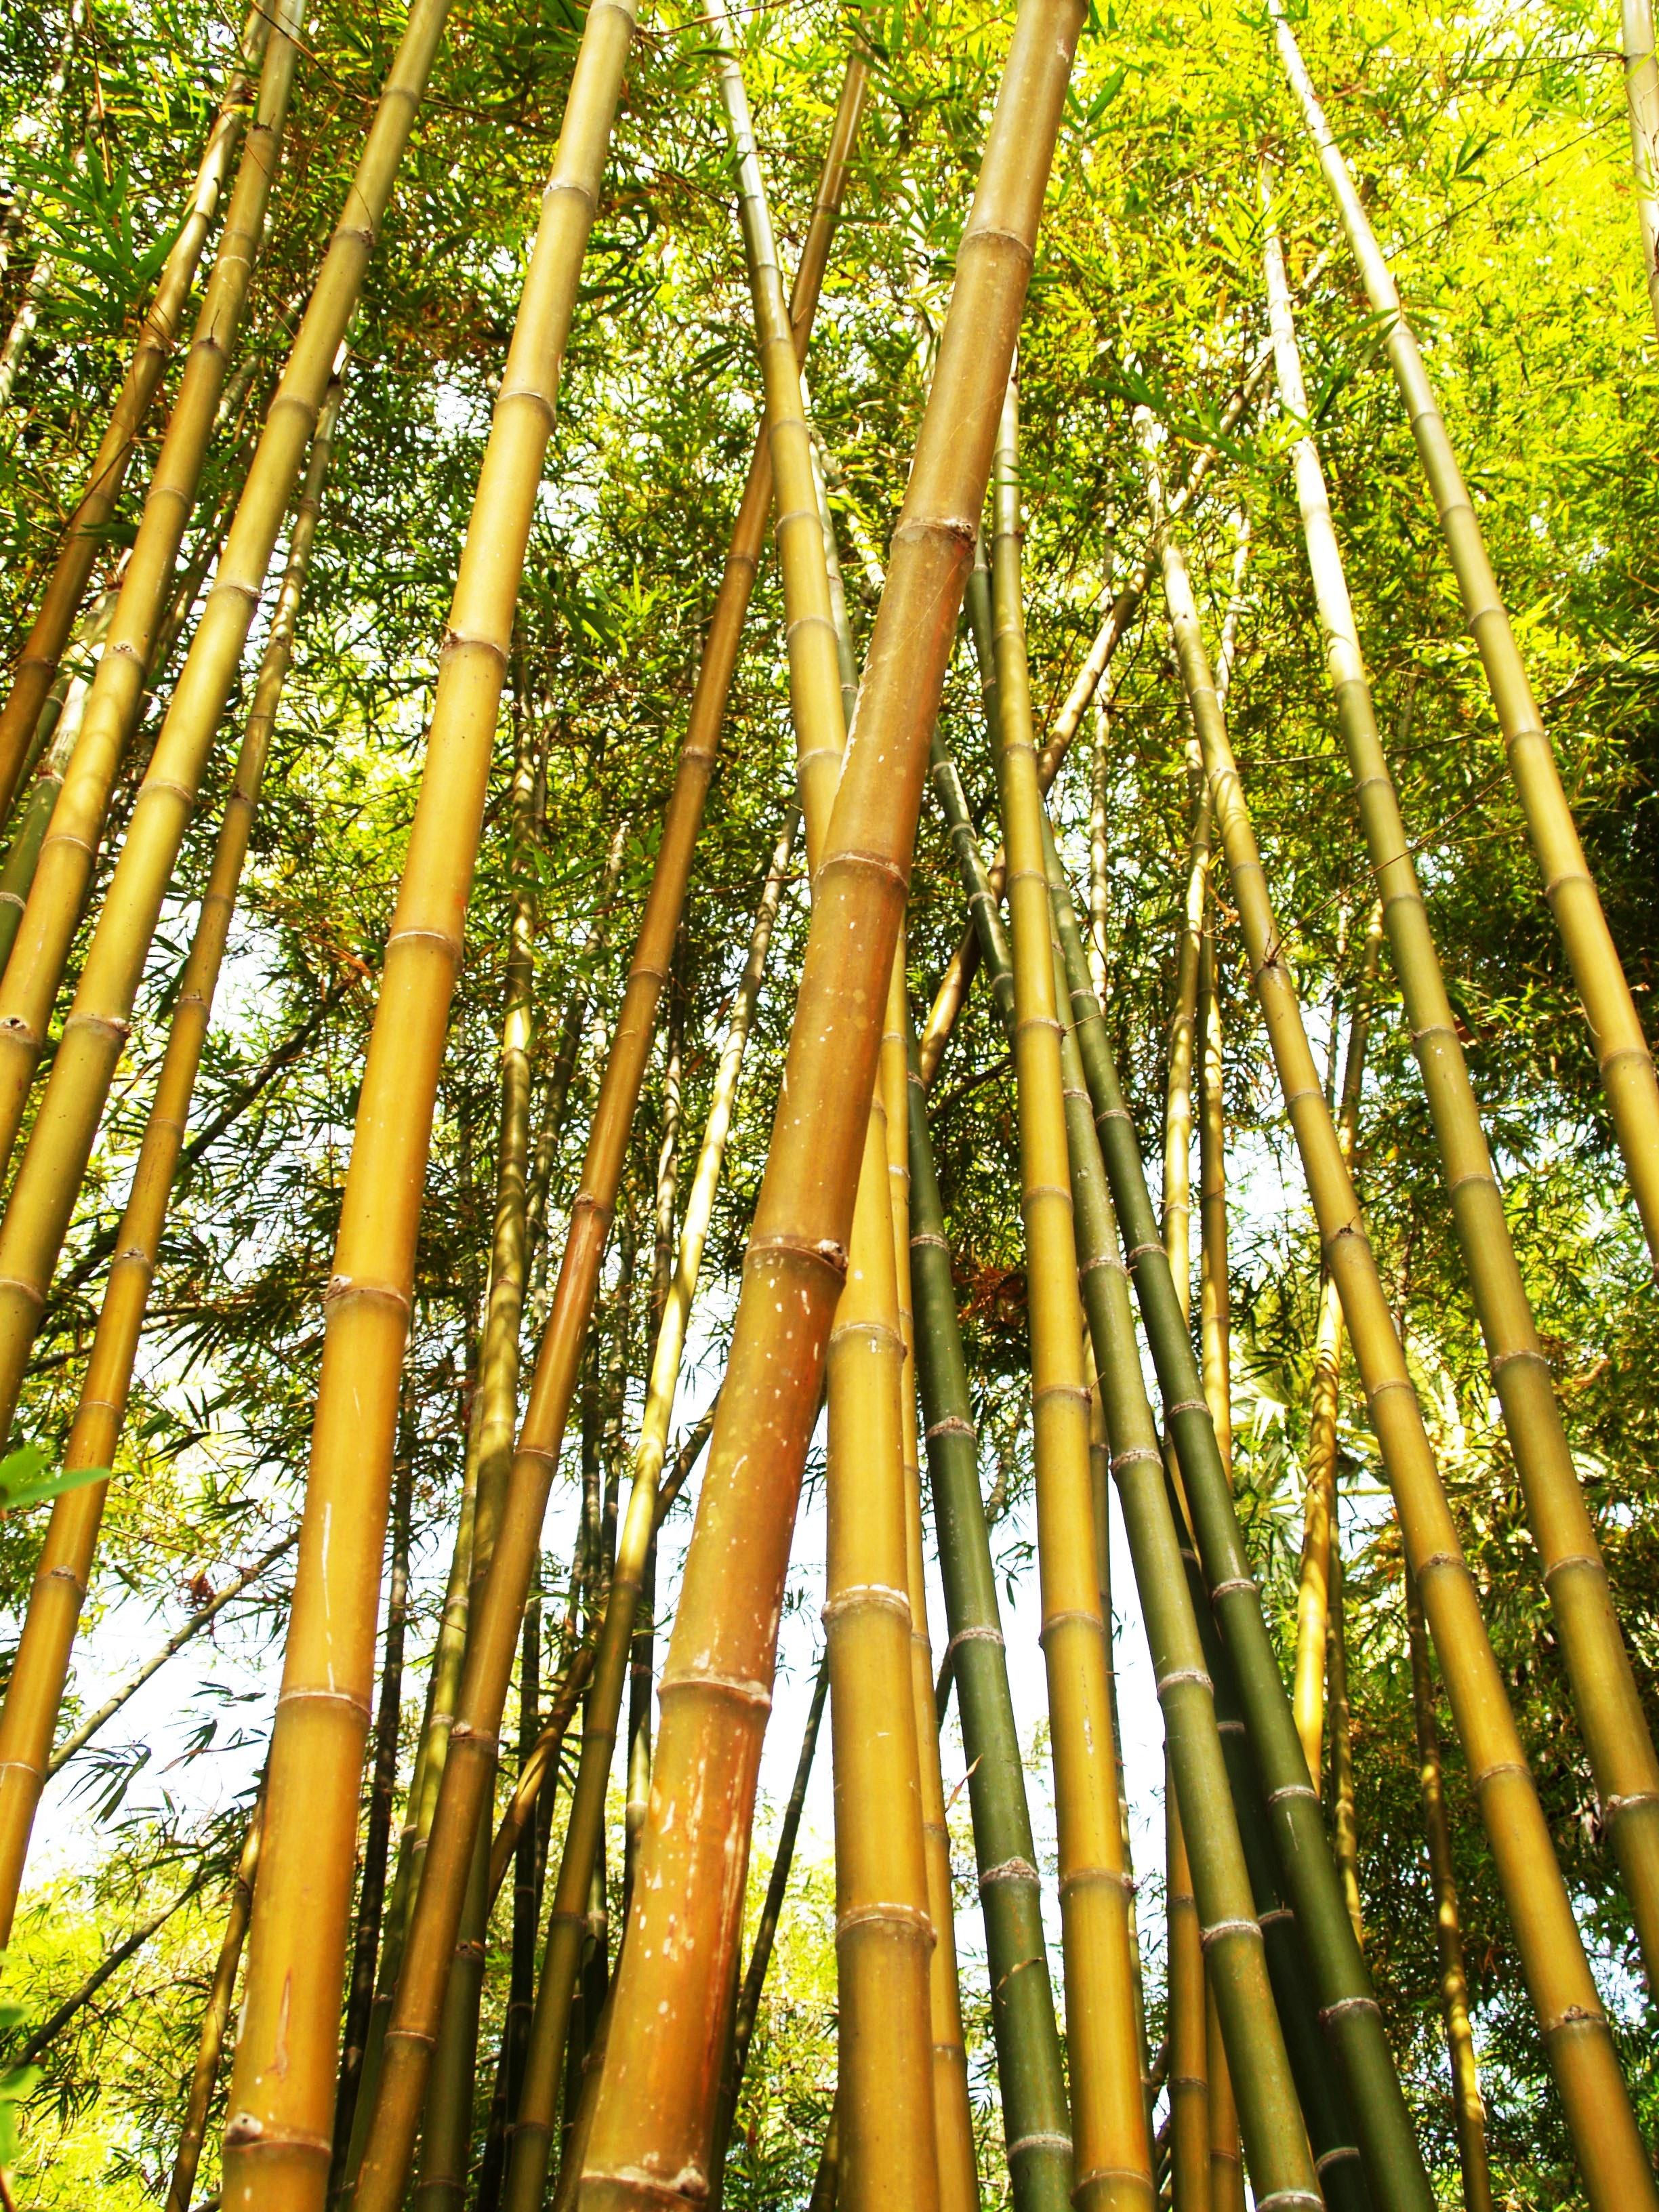 Bamboo Tree During Daytime Free Stock Photo